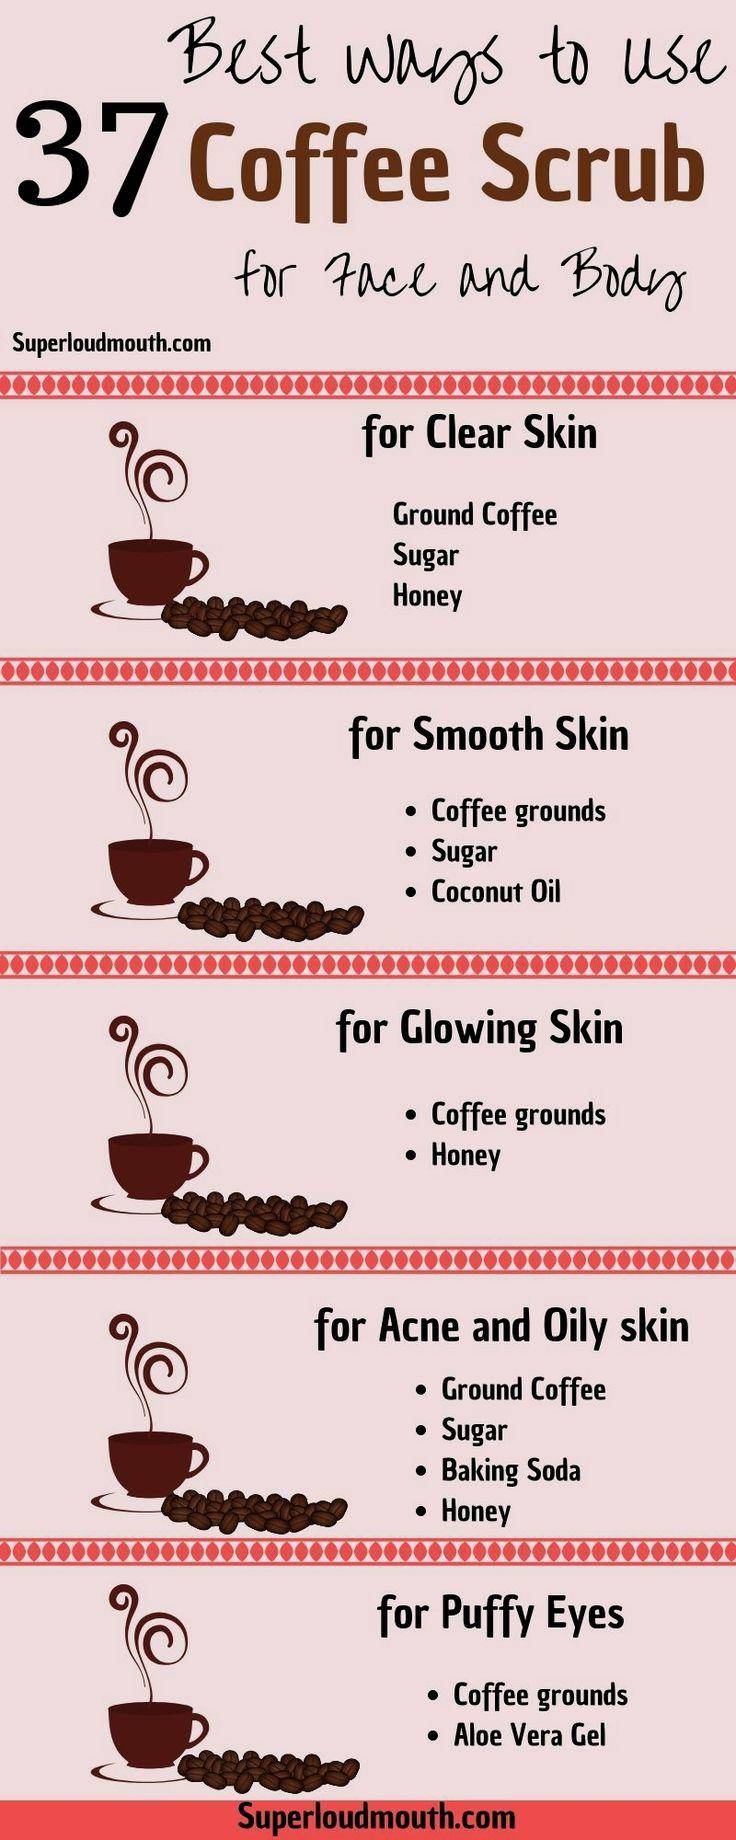 body #skin #care #coffee #beautytips #scrub #skincare